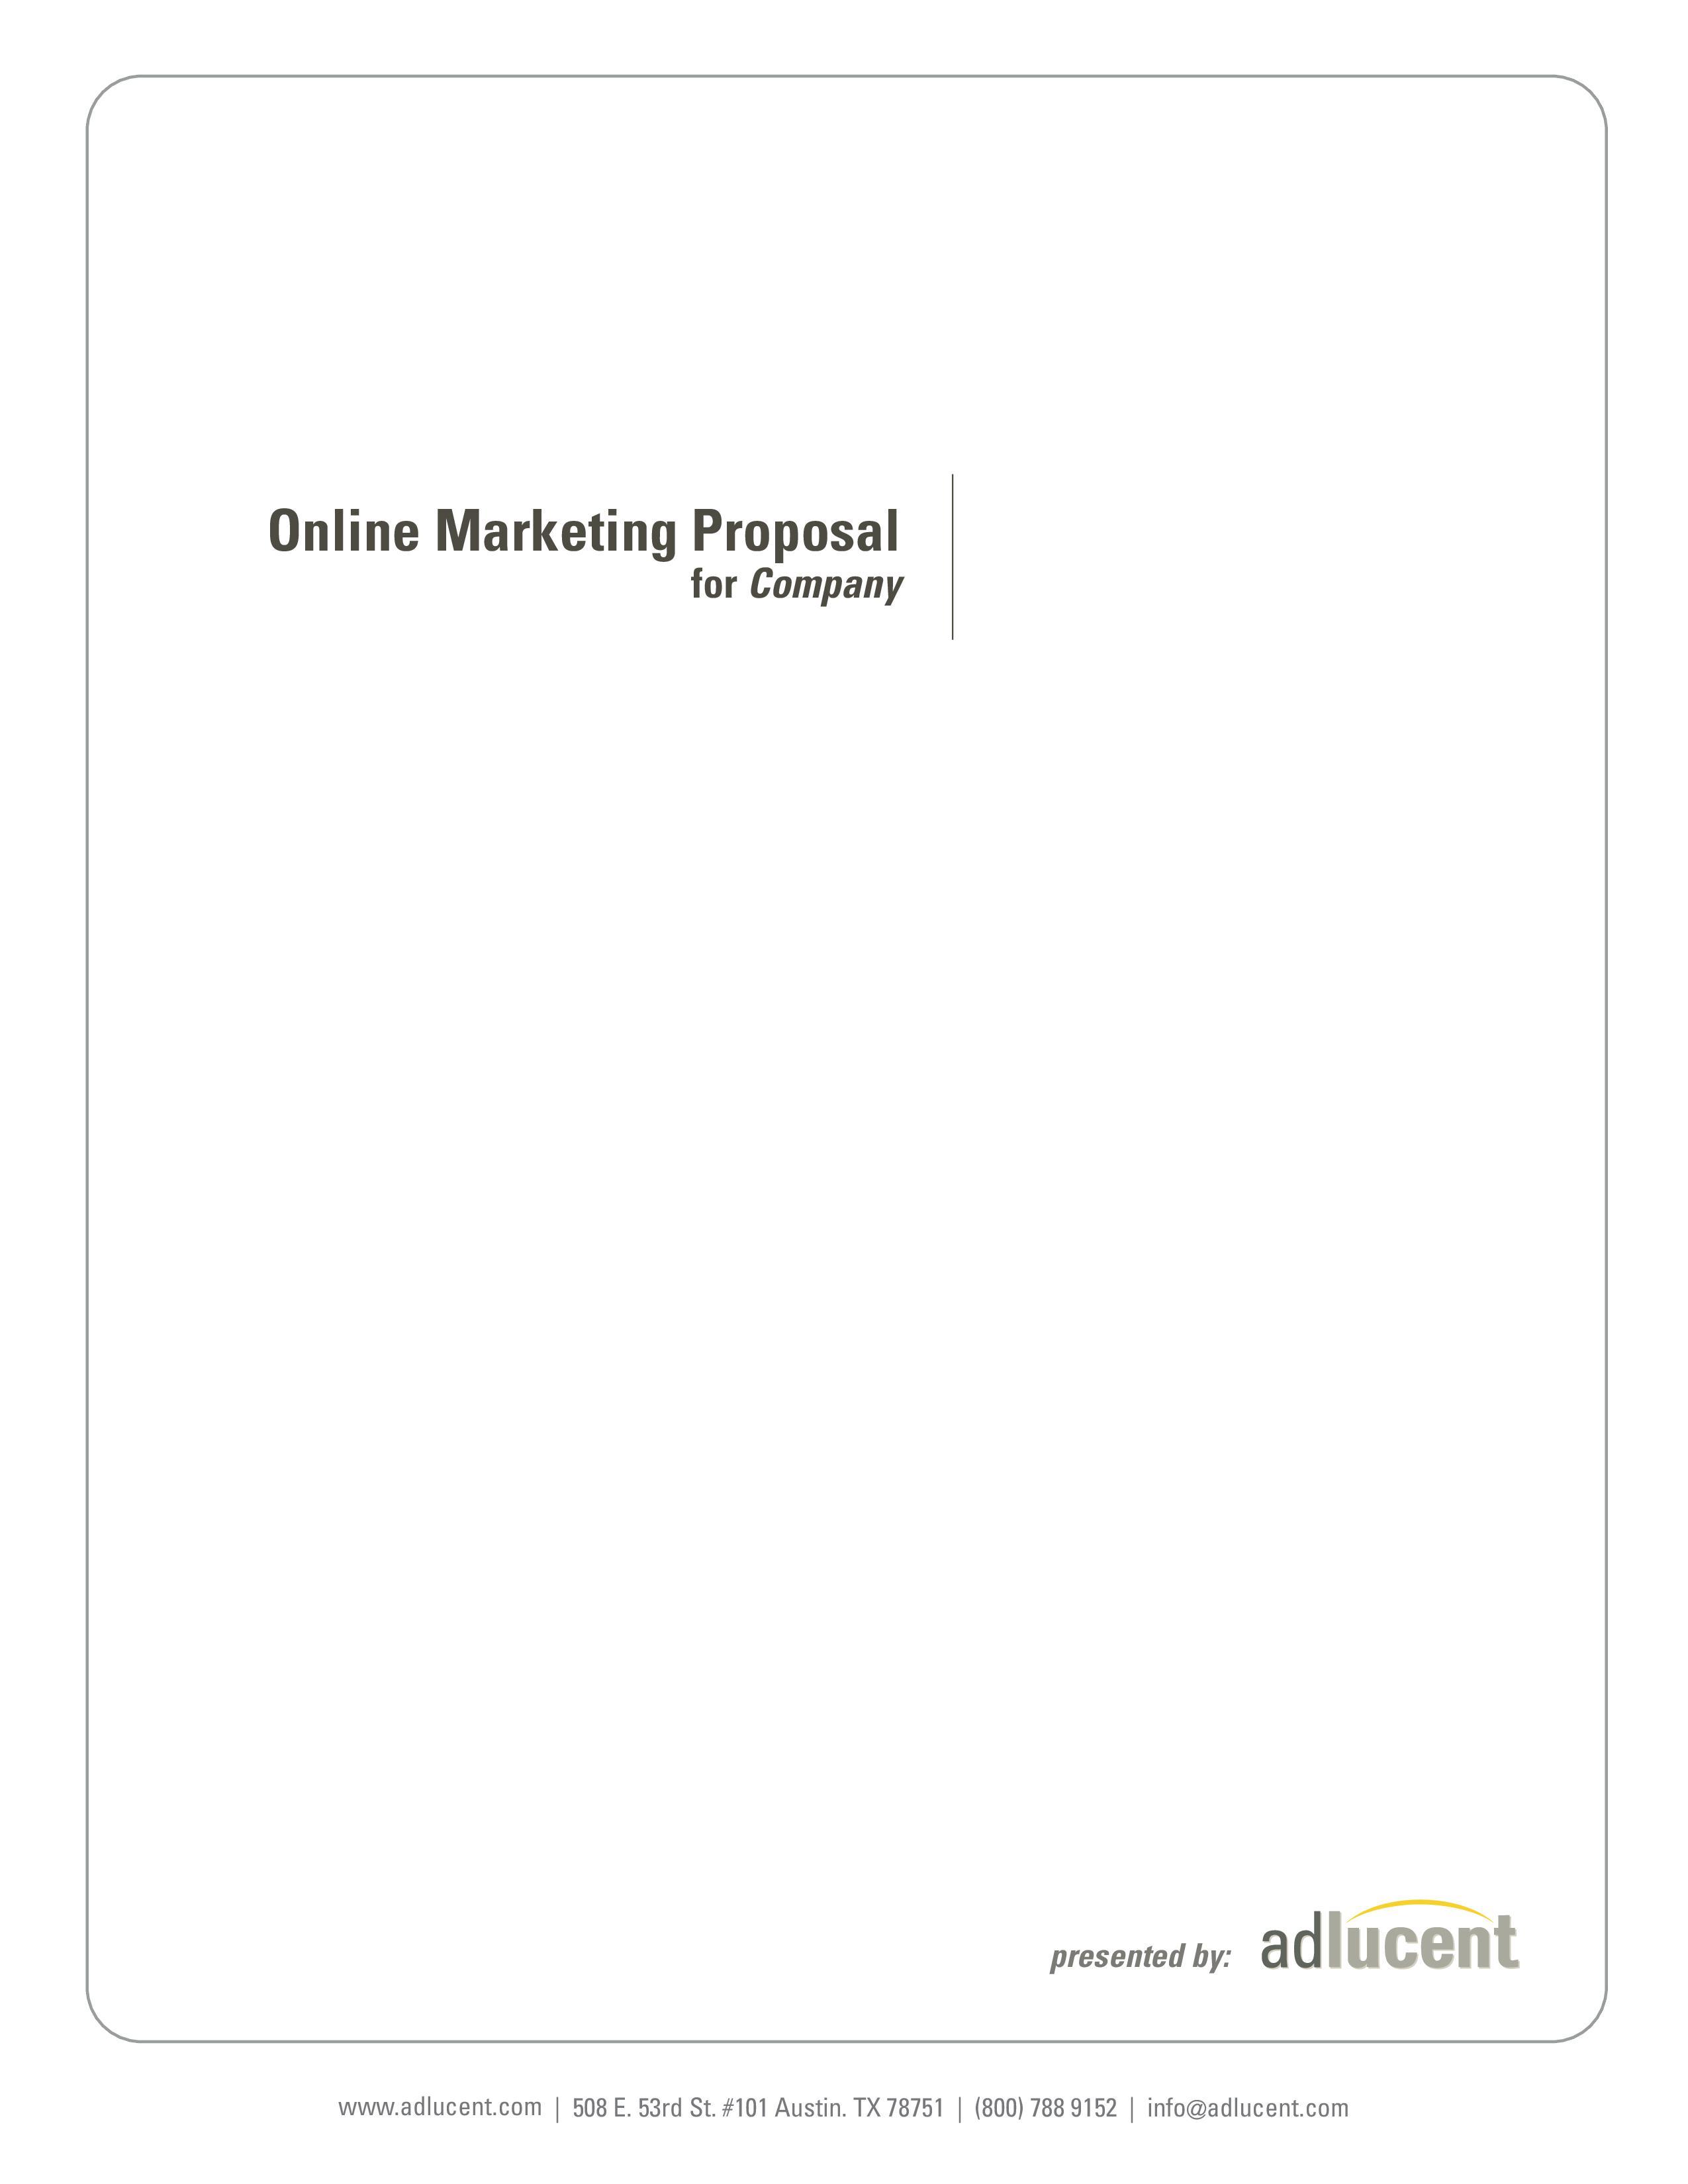 Free Marketing Proposal Templates